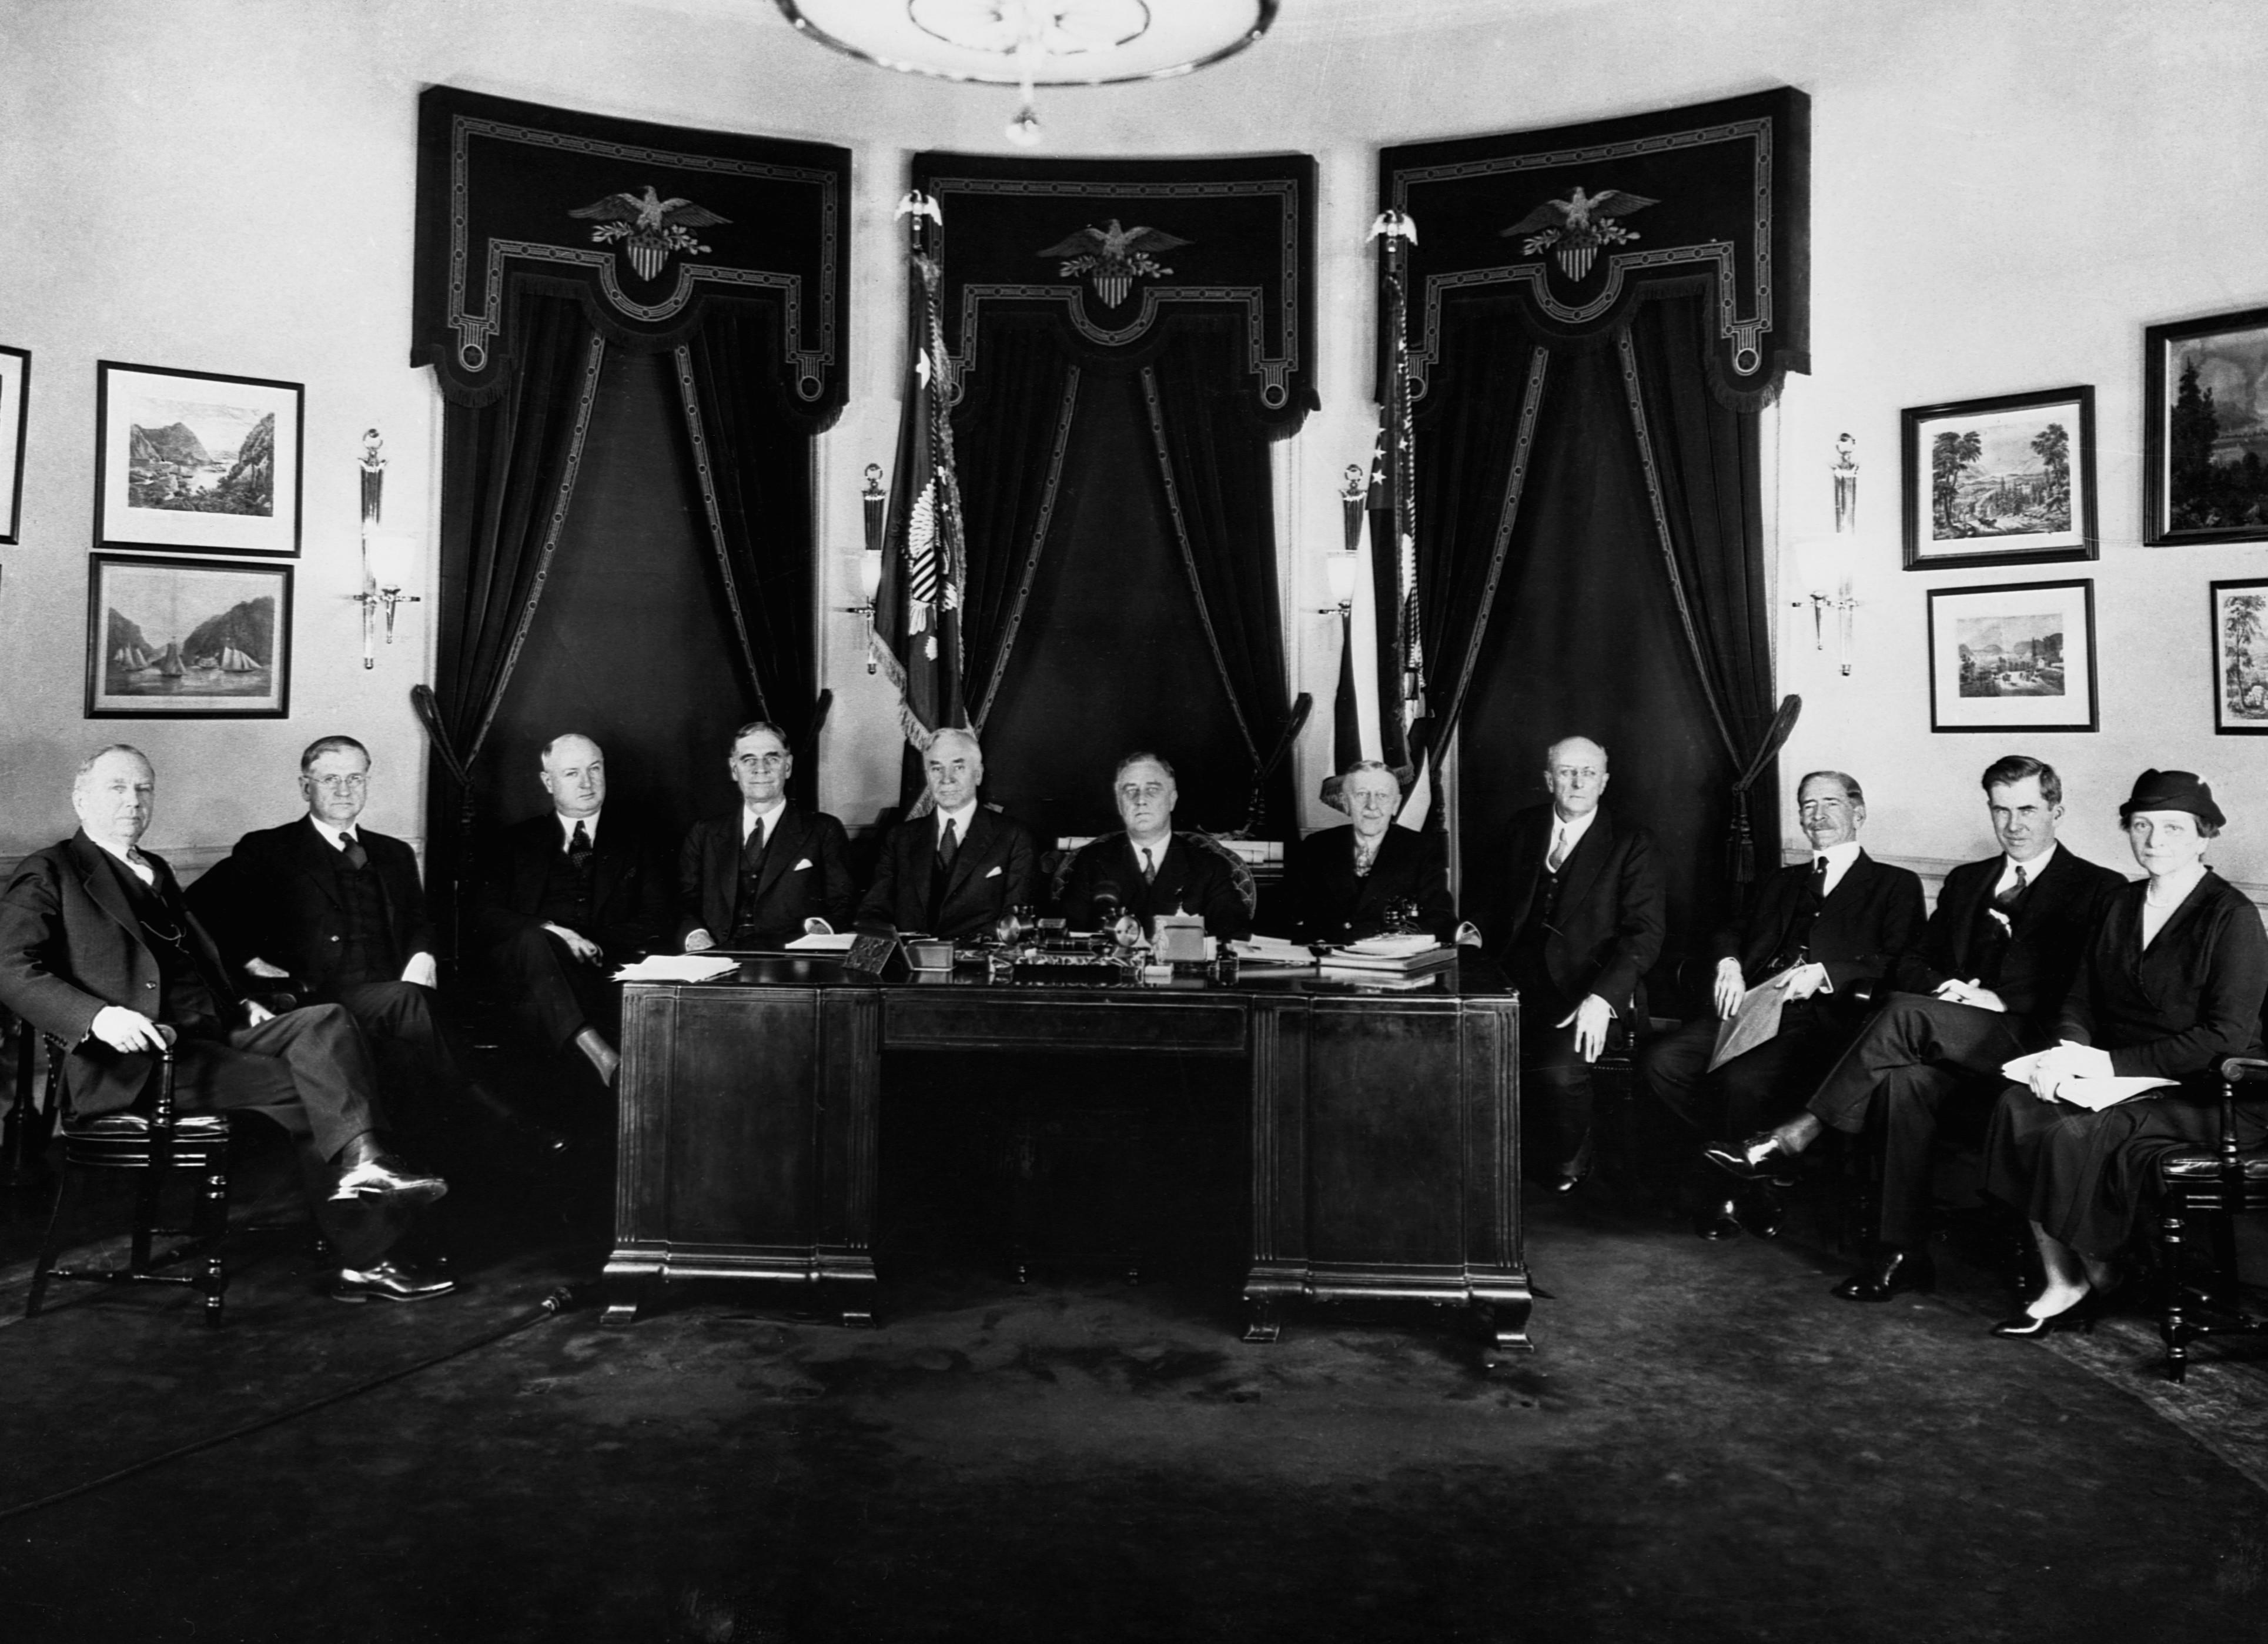 president-roosevelt-and-his-first-cabinet - Franklin D. Roosevelt ...